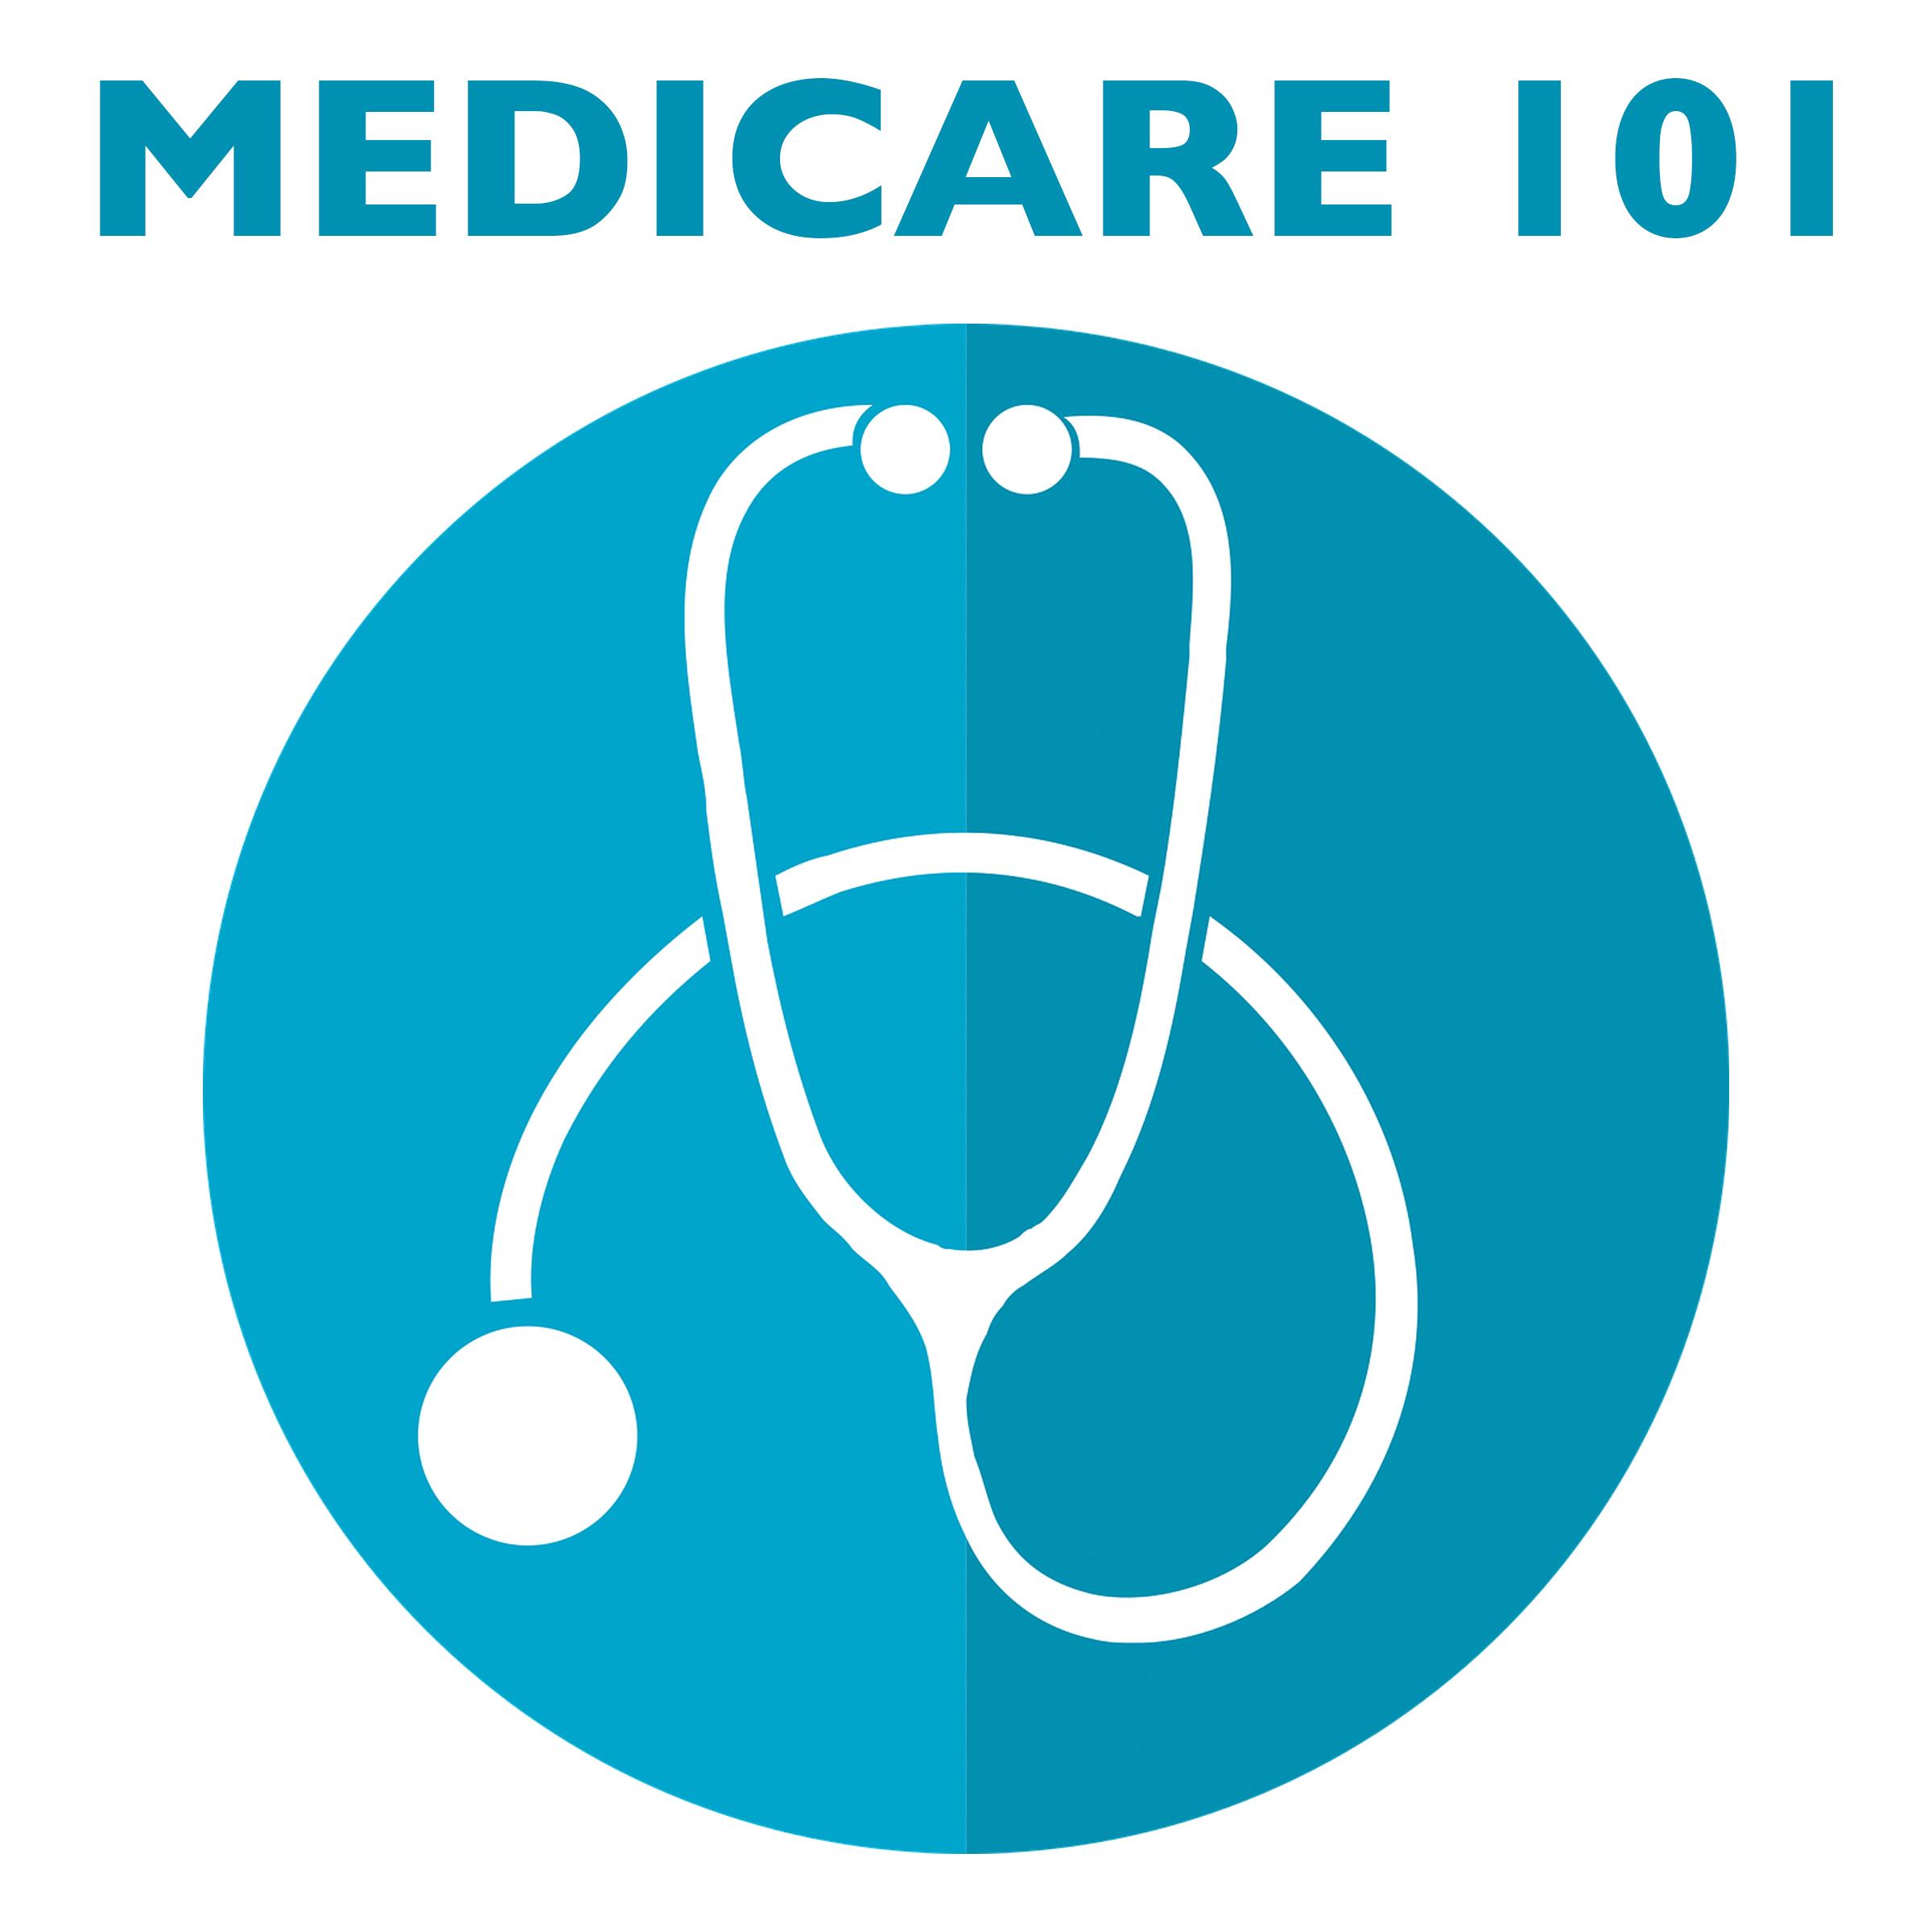 medicare 101 web.jpg